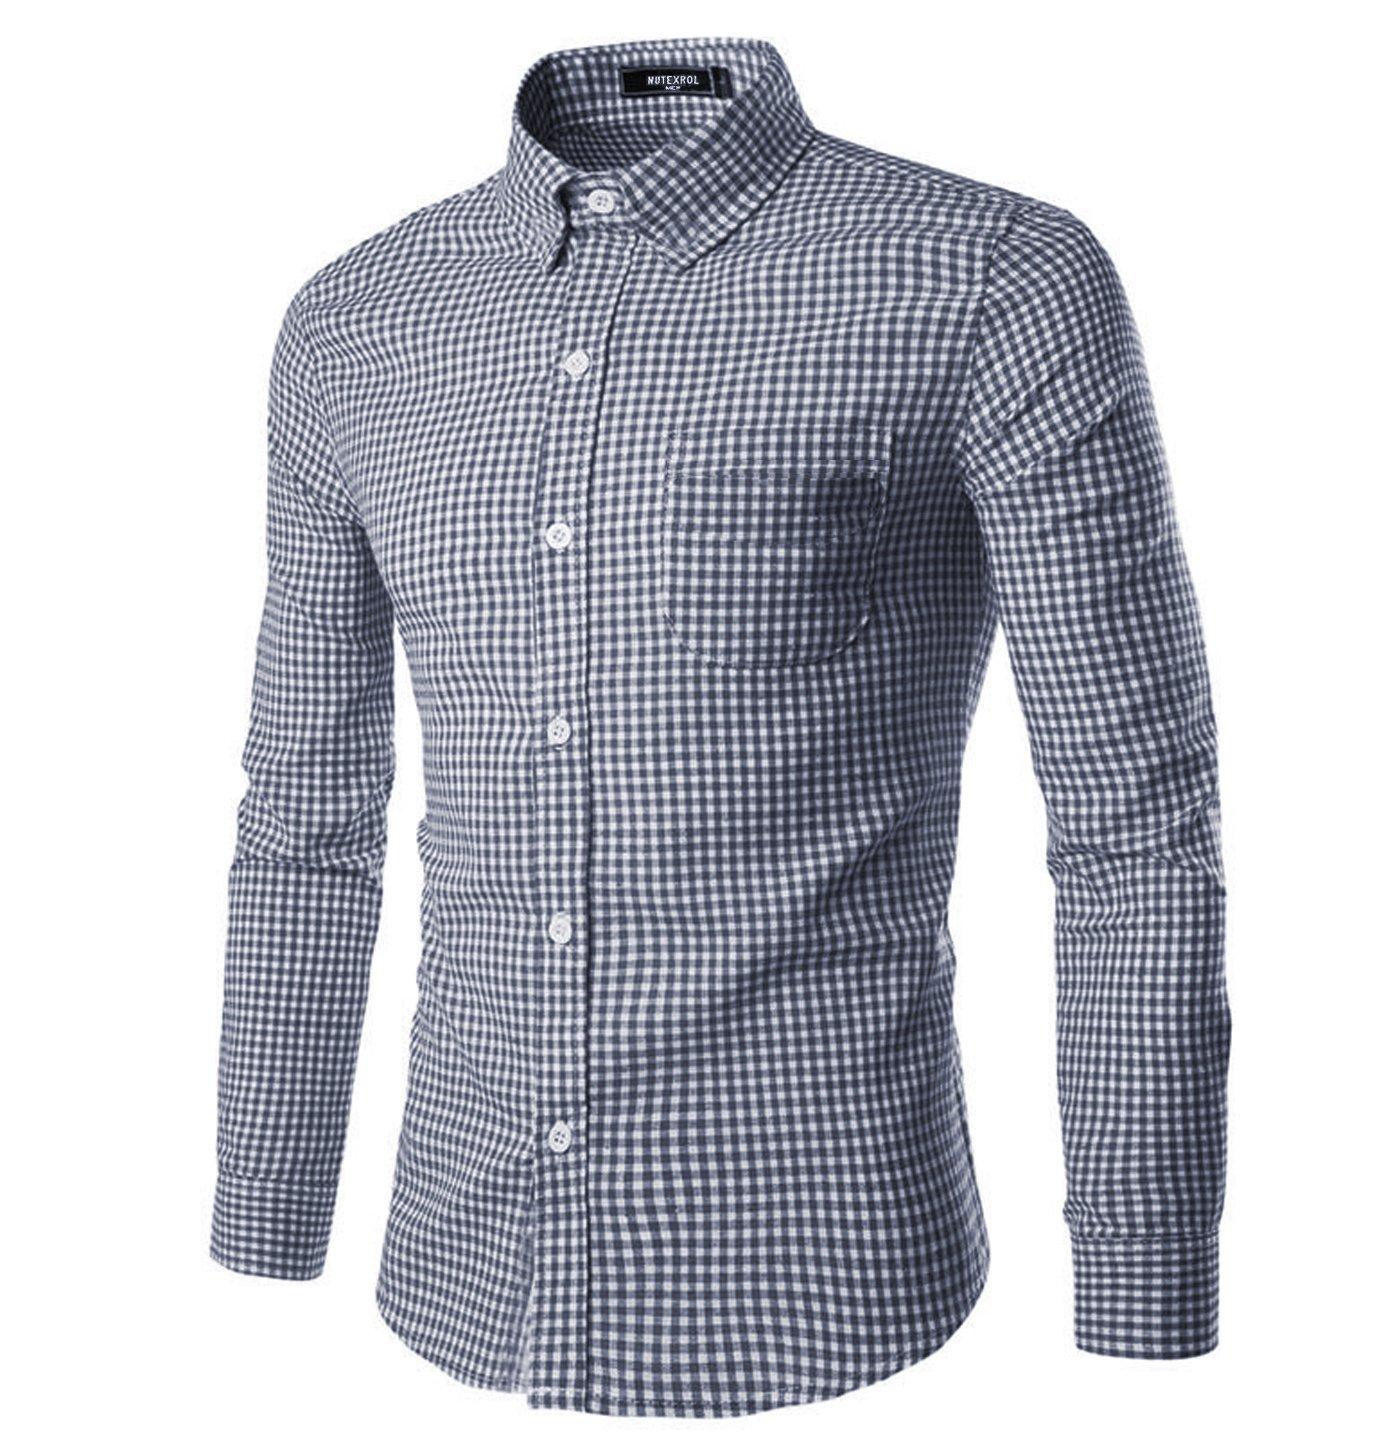 0202a96d Get Quotations · NUTEXROL Men Plaid Cotton Casual Slim Fit Long Sleeve  Button Down Dress Shirts